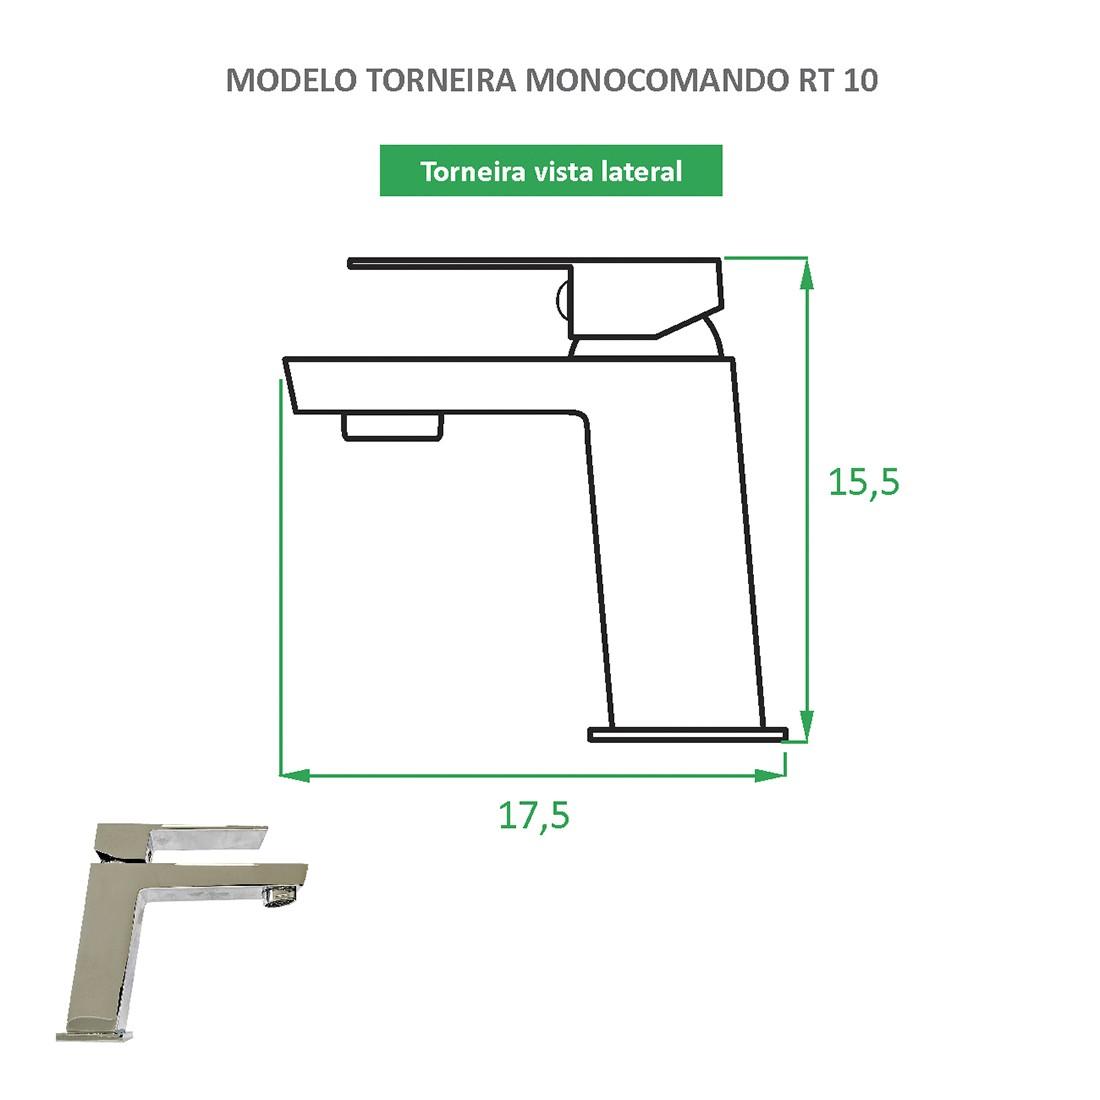 Torneira Monocomando Quadrada RT 10